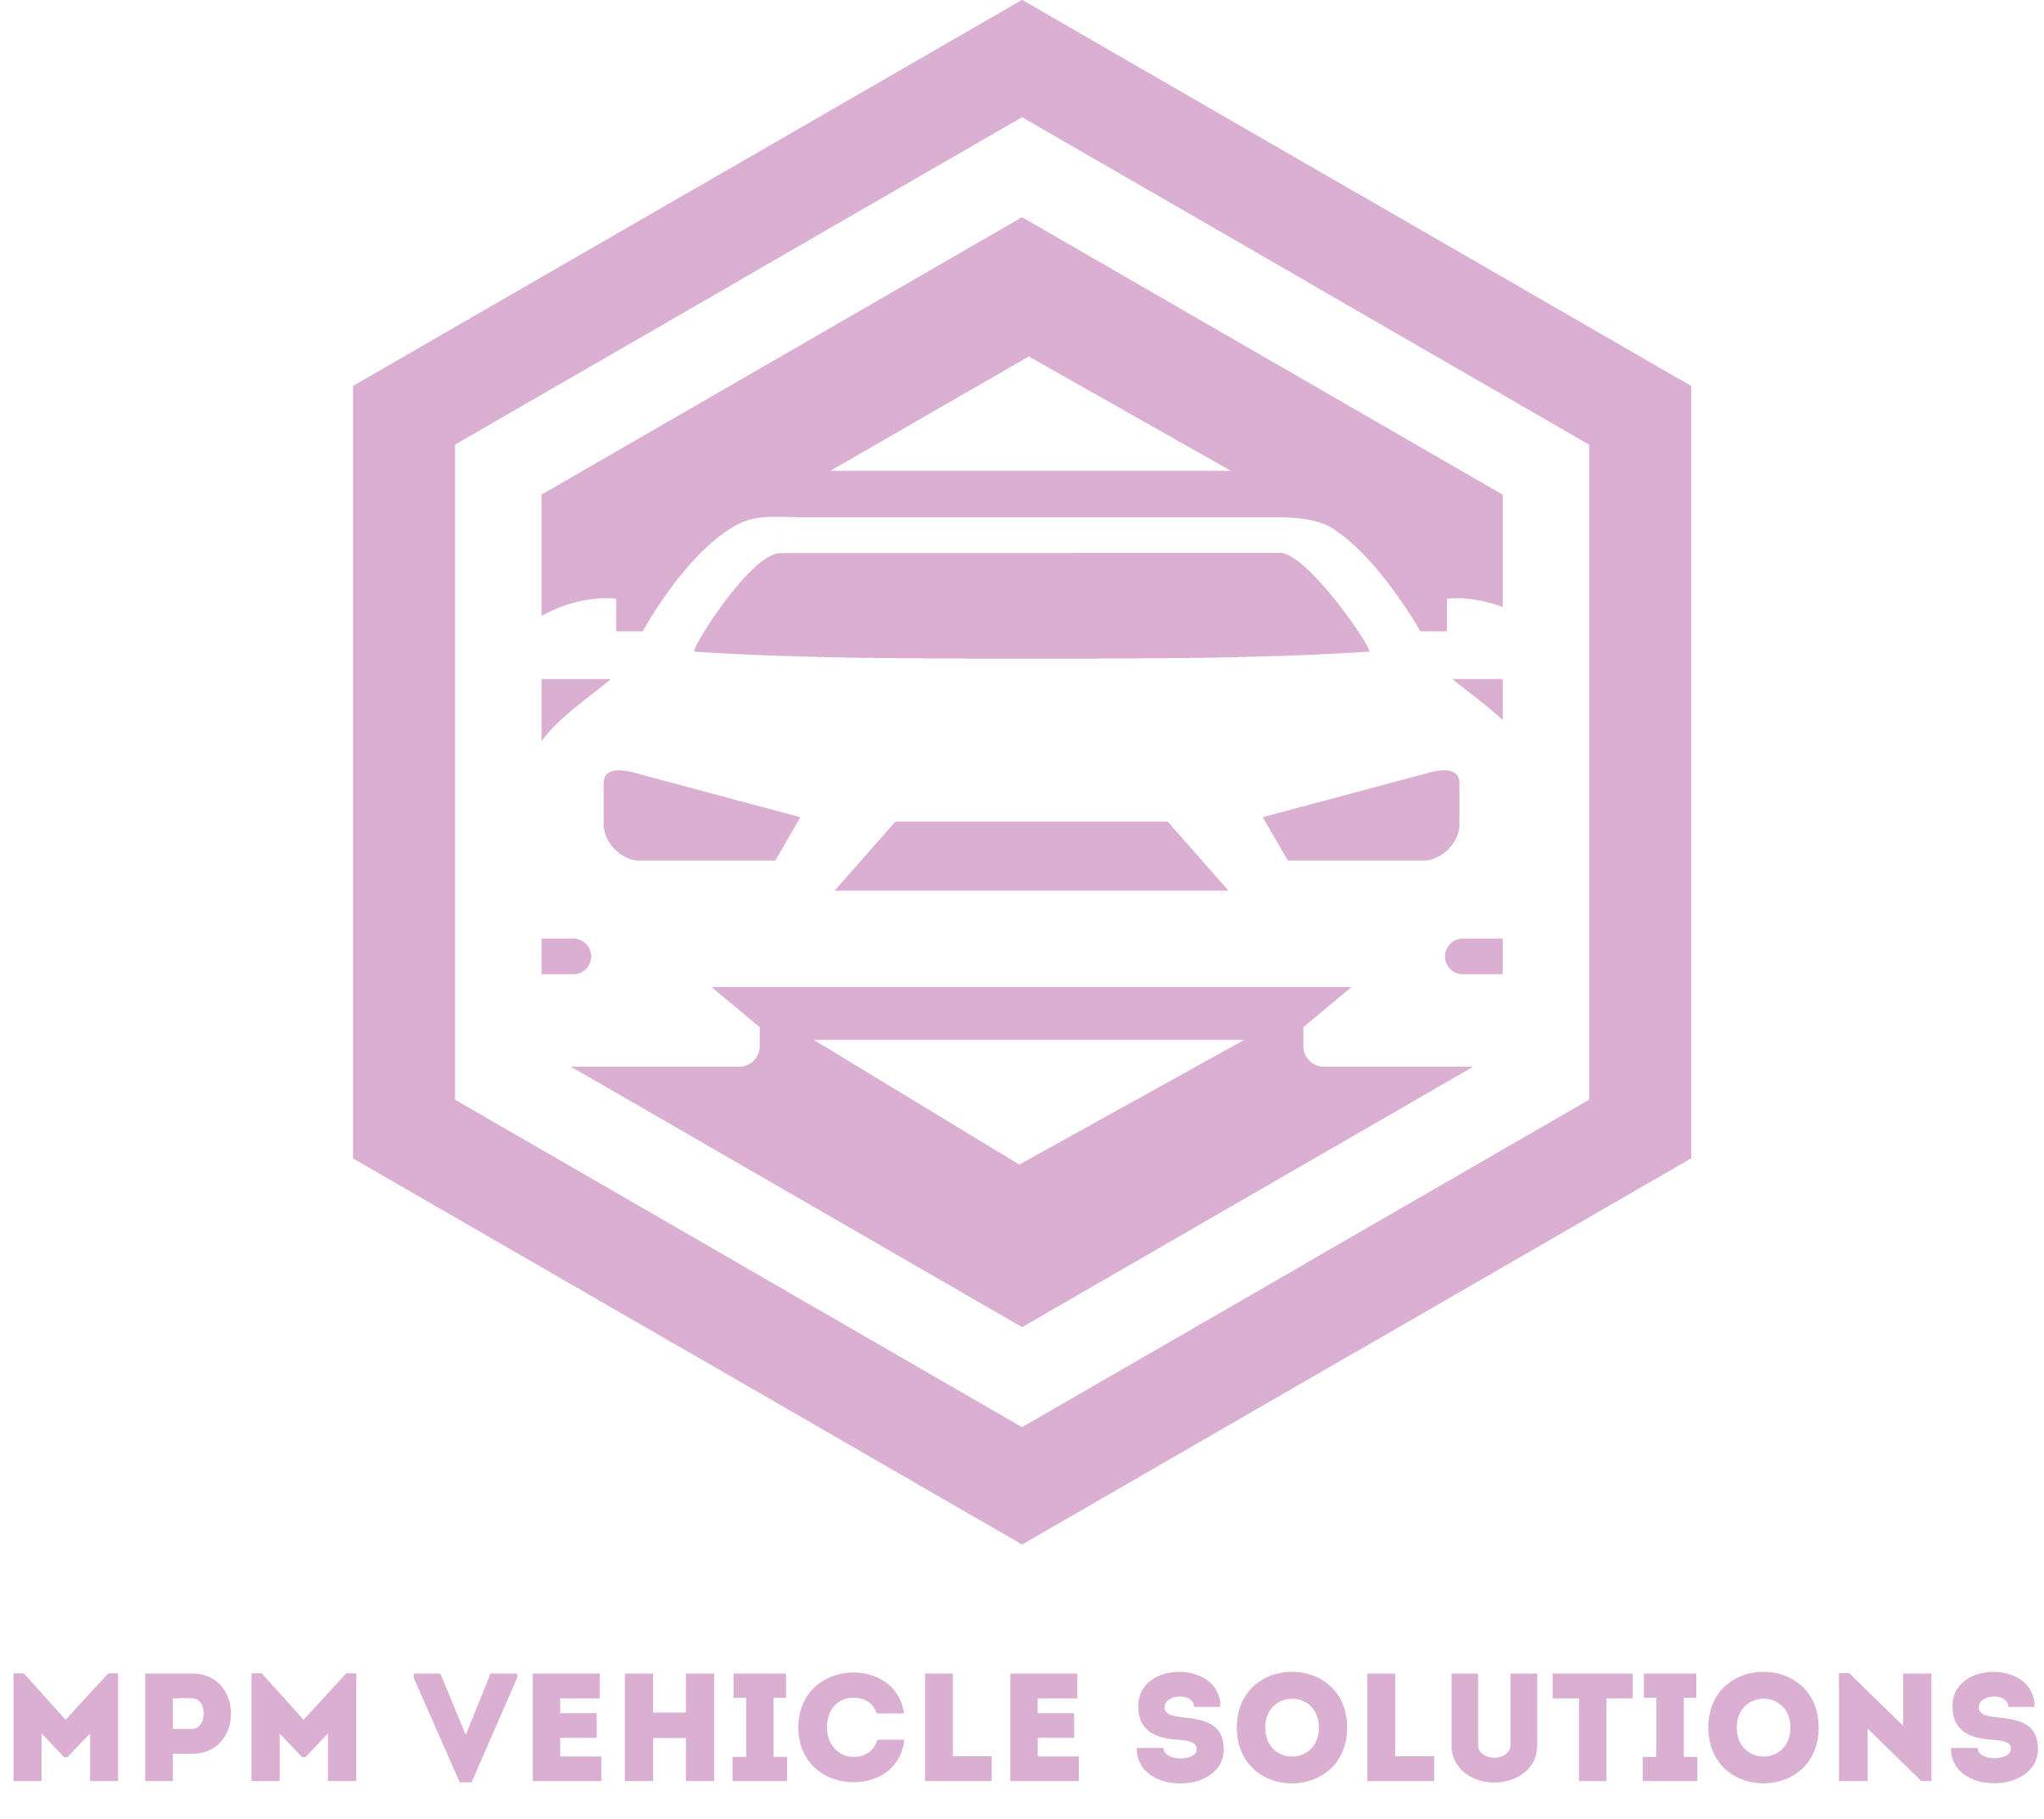 MPM Vehicle Solutions